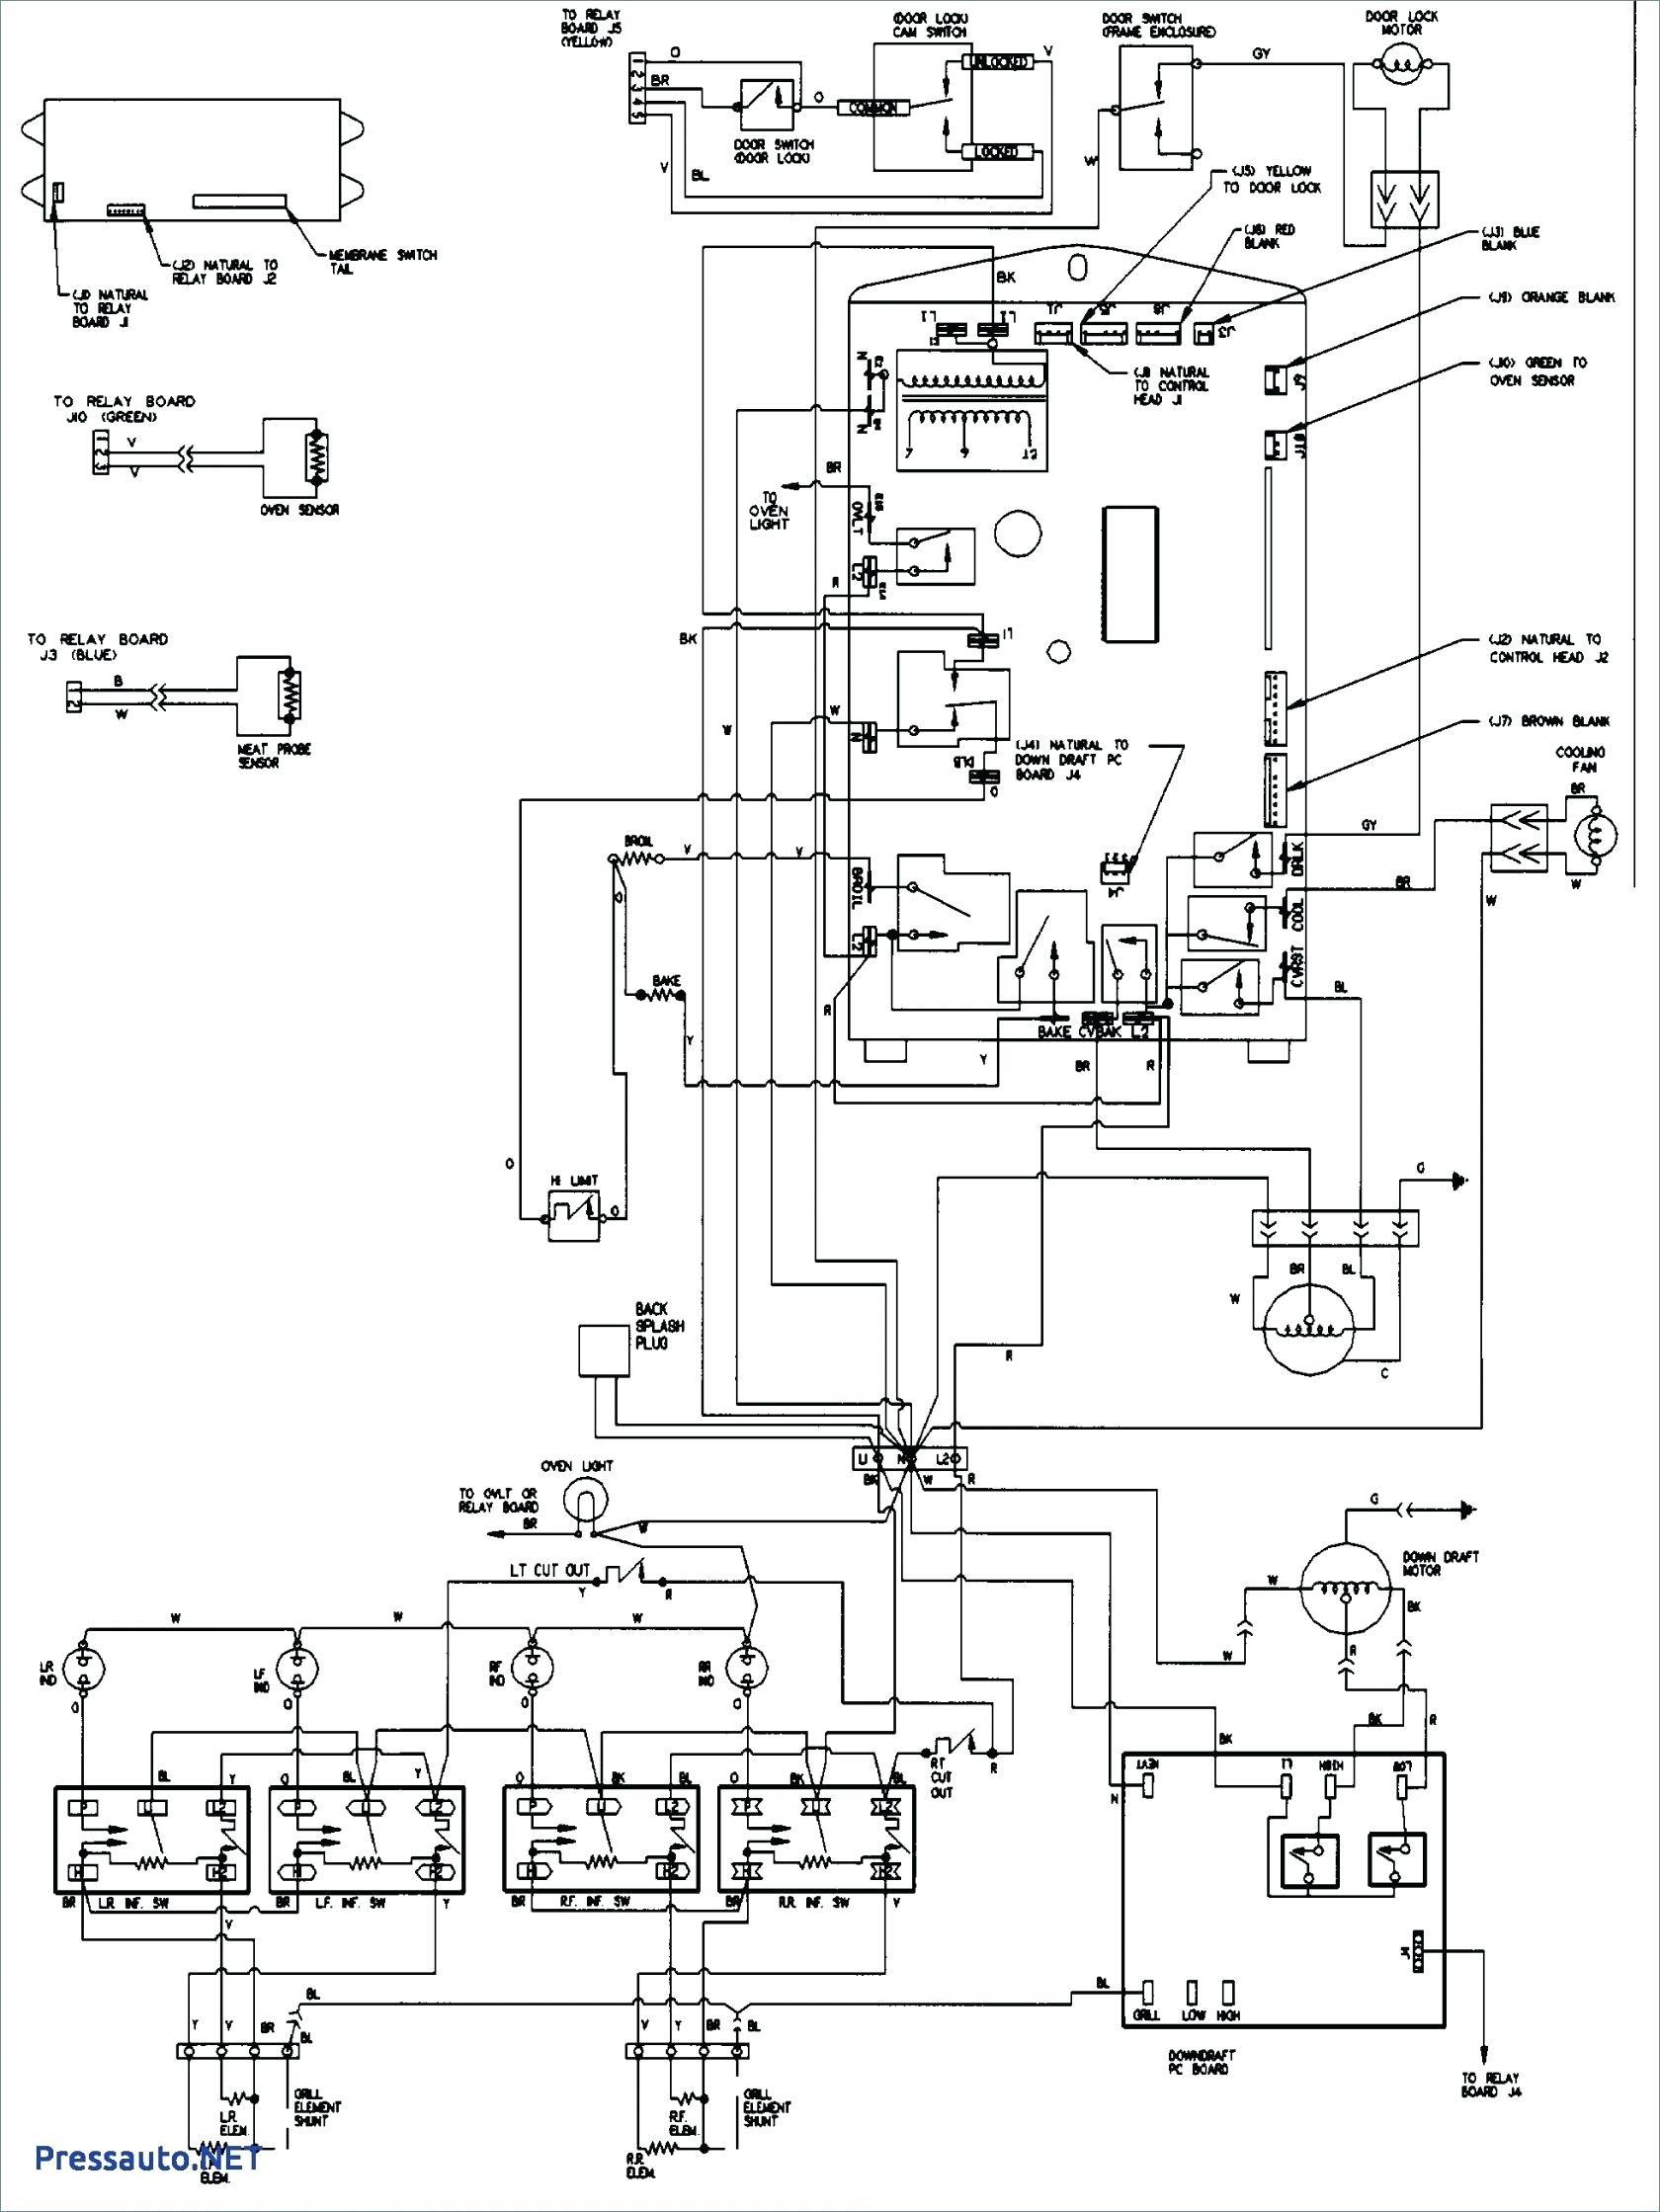 wiring diagram lennox furnace